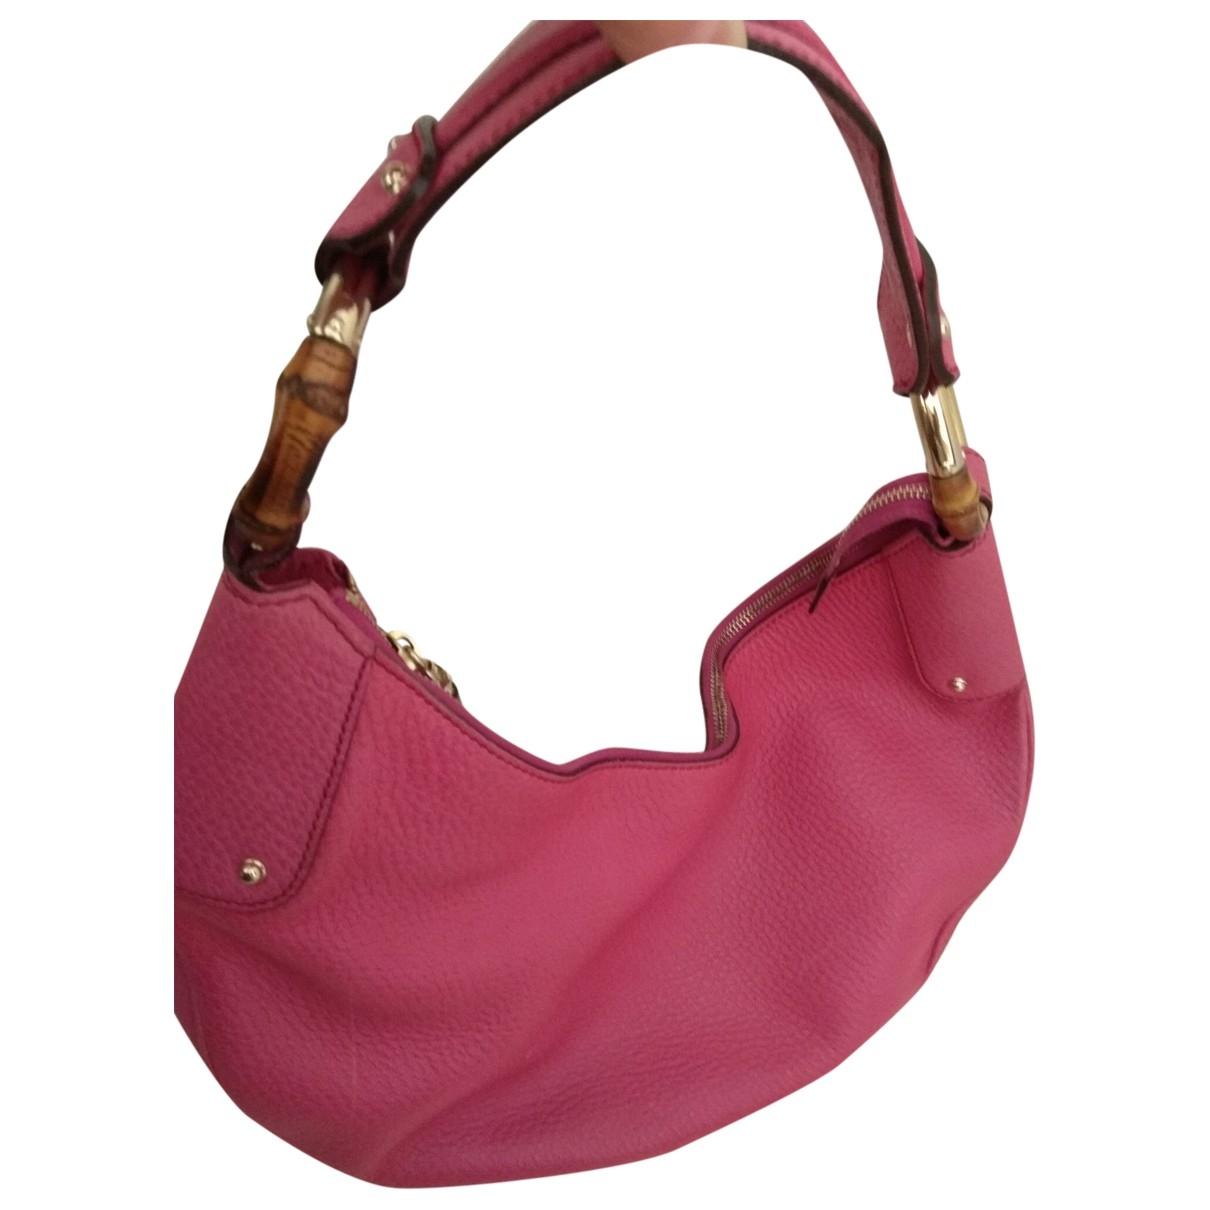 Gucci Bamboo Handtasche in  Rosa Leder